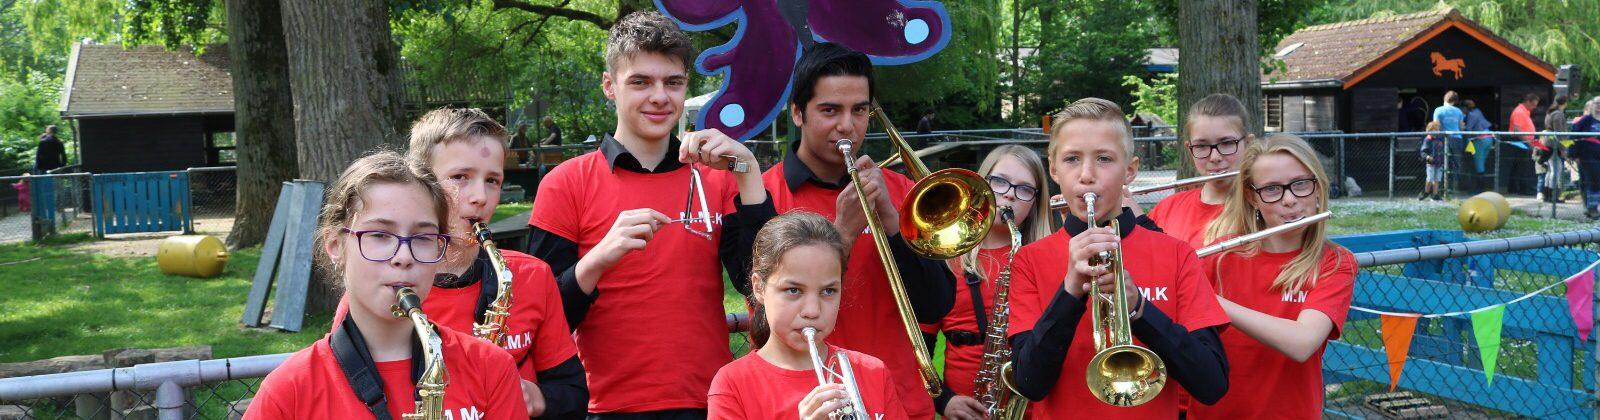 Middelburgs Muziekkorps